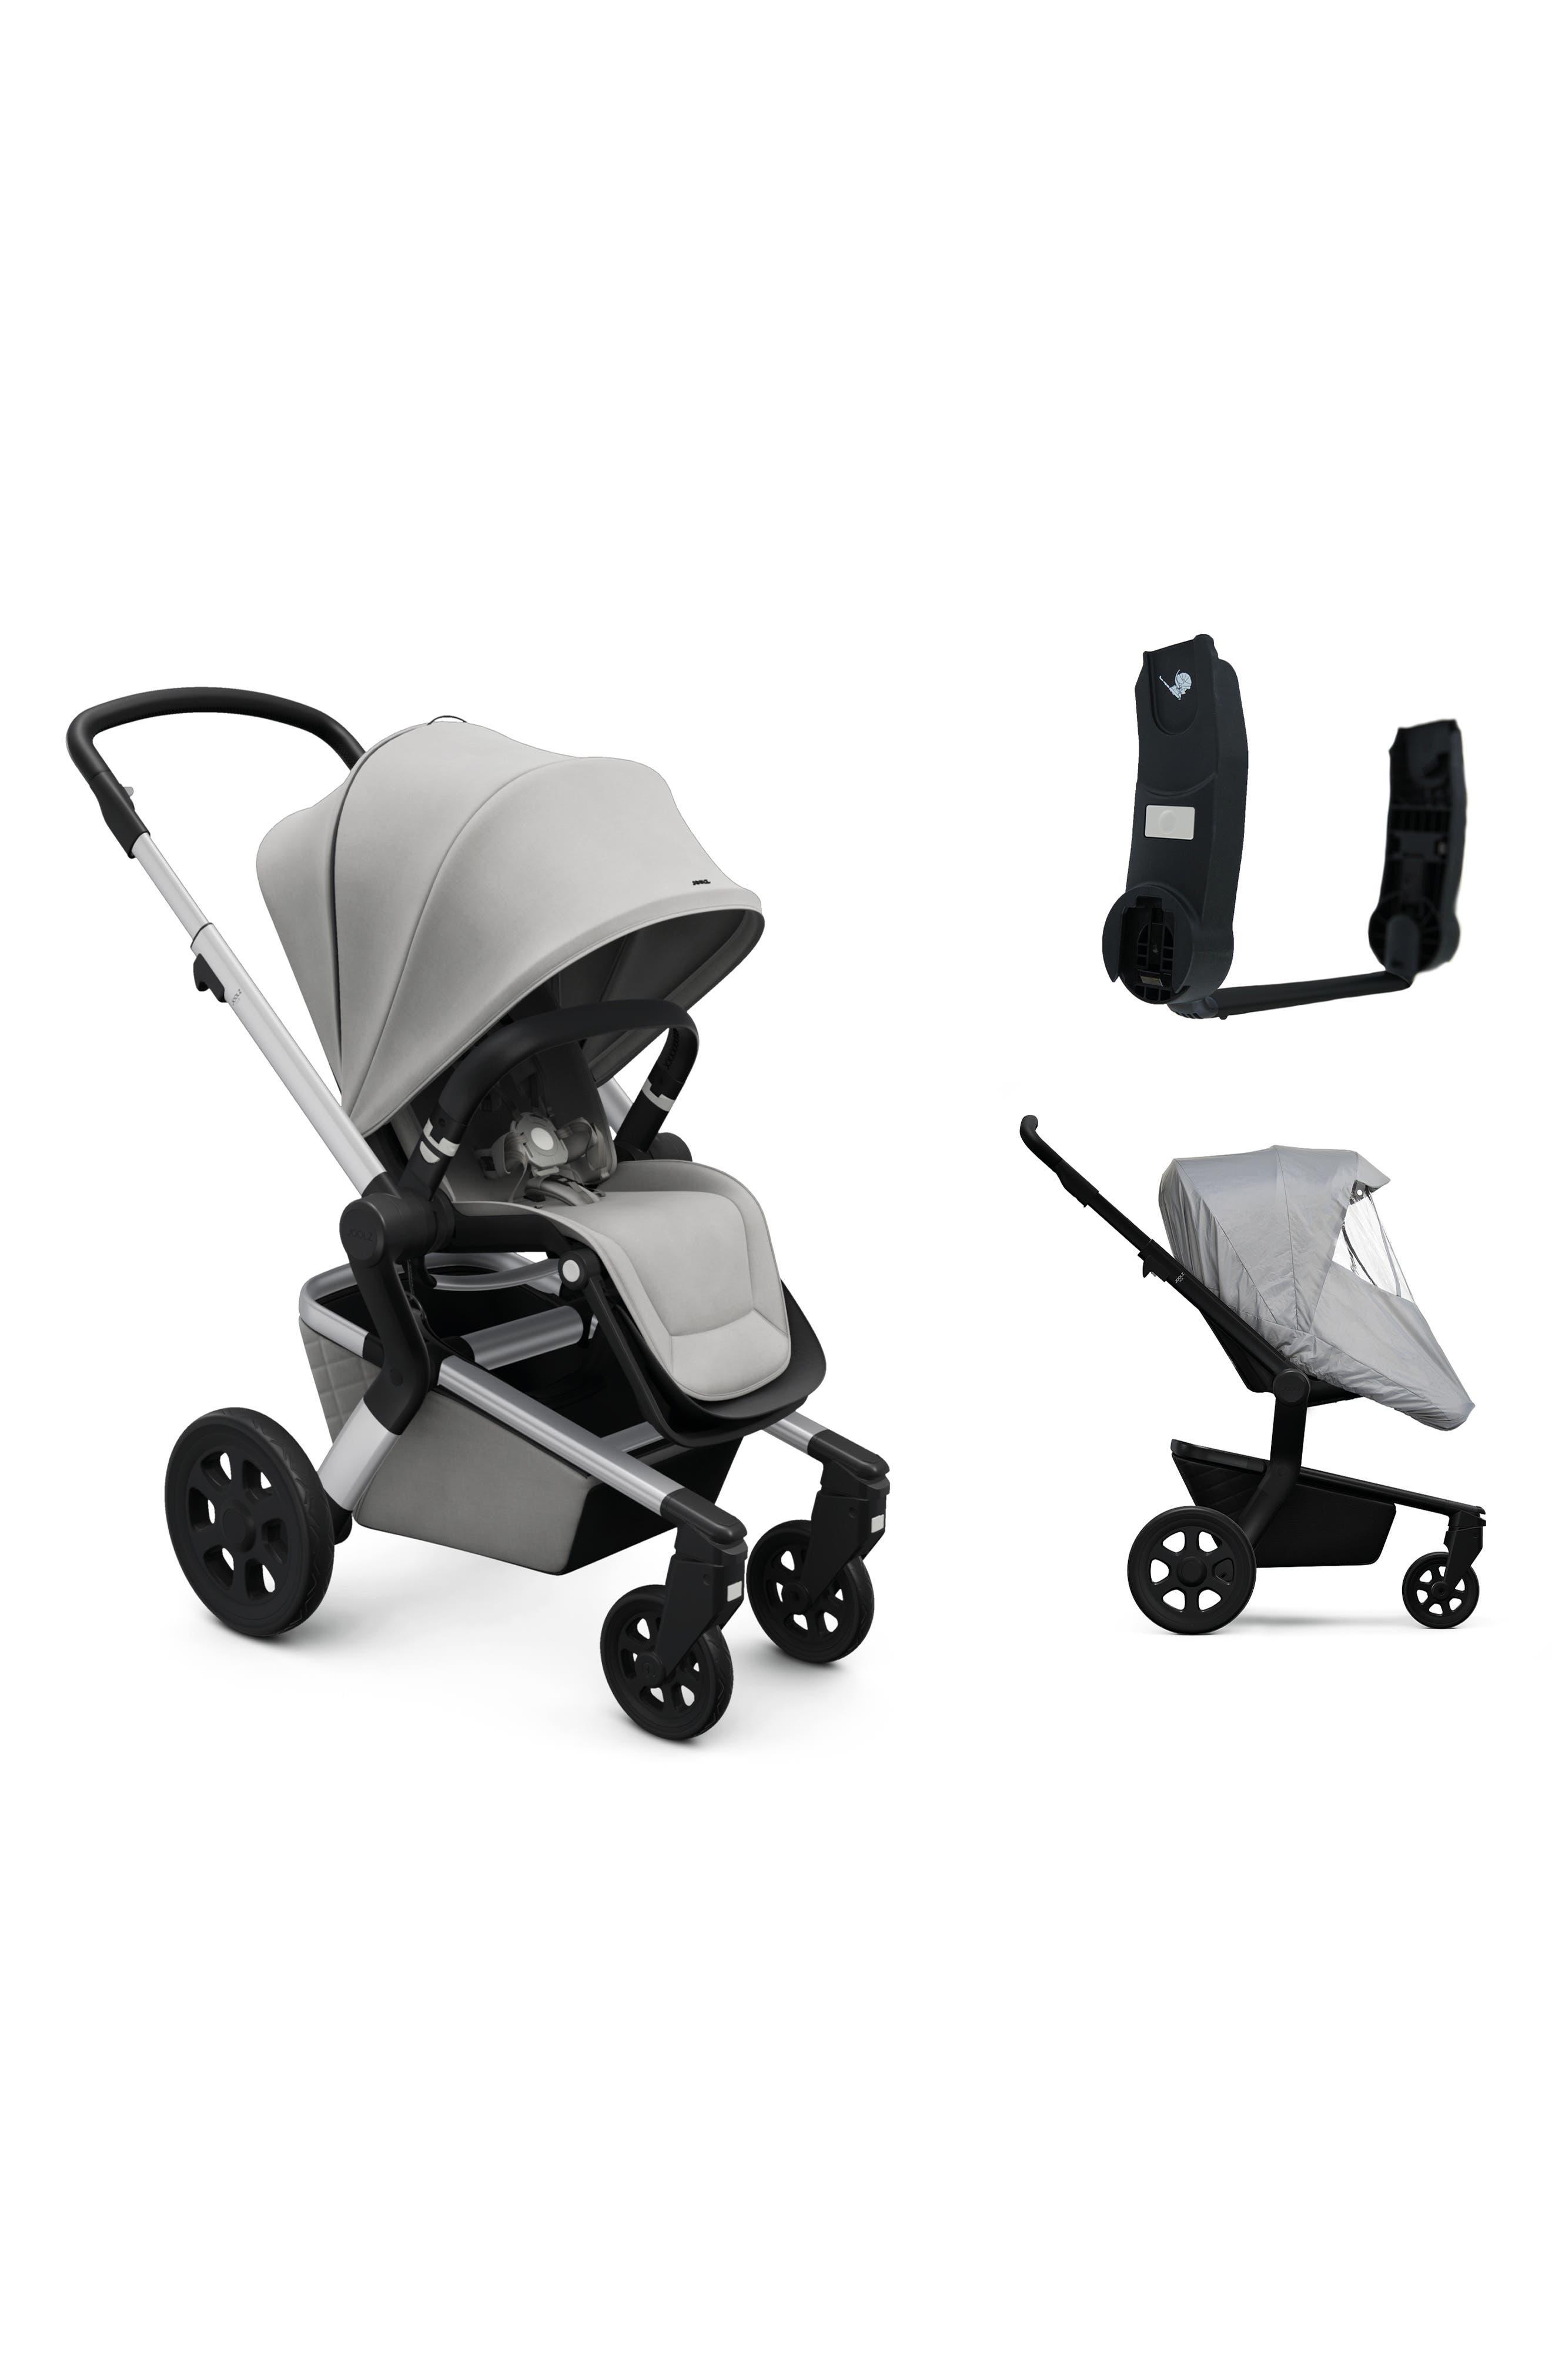 Joolz Infant Joolz Hub Complete Stroller & Accessories Bundle, Size One Size - Metallic